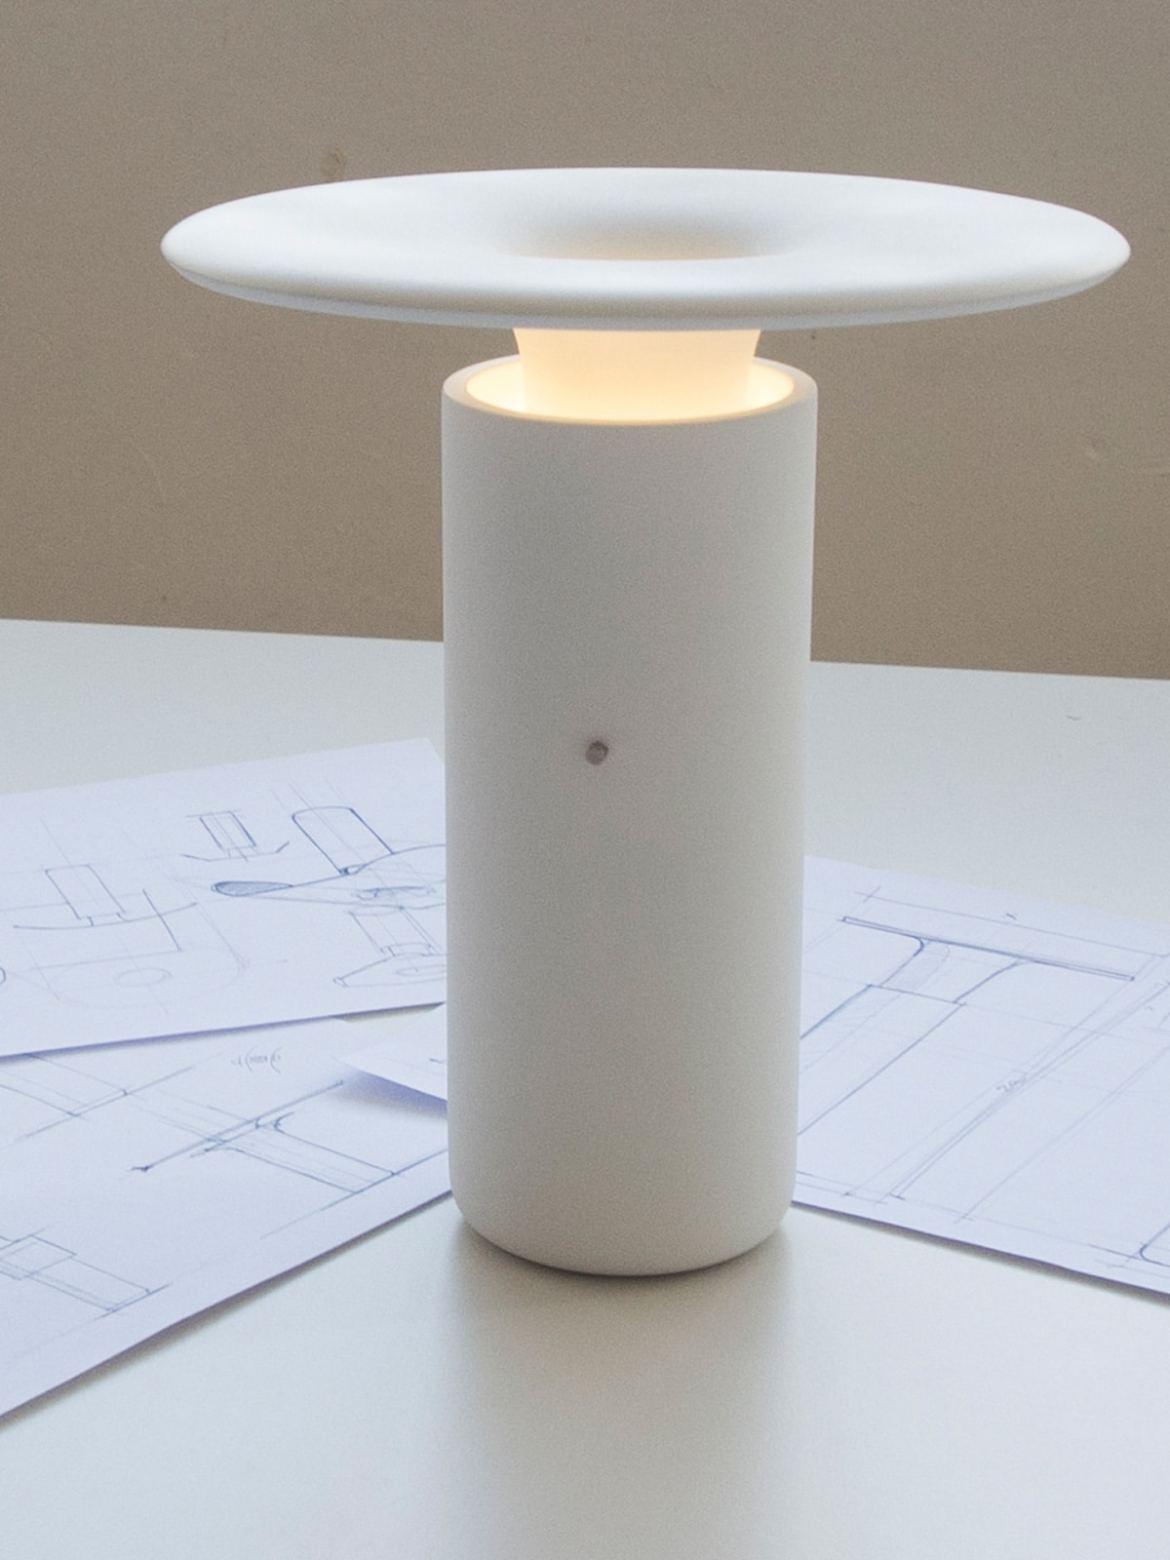 DesignOrt Blog: Neuigkeiten Pottery Project Pott spanische Keramik Lampe Nais Luis Eslava